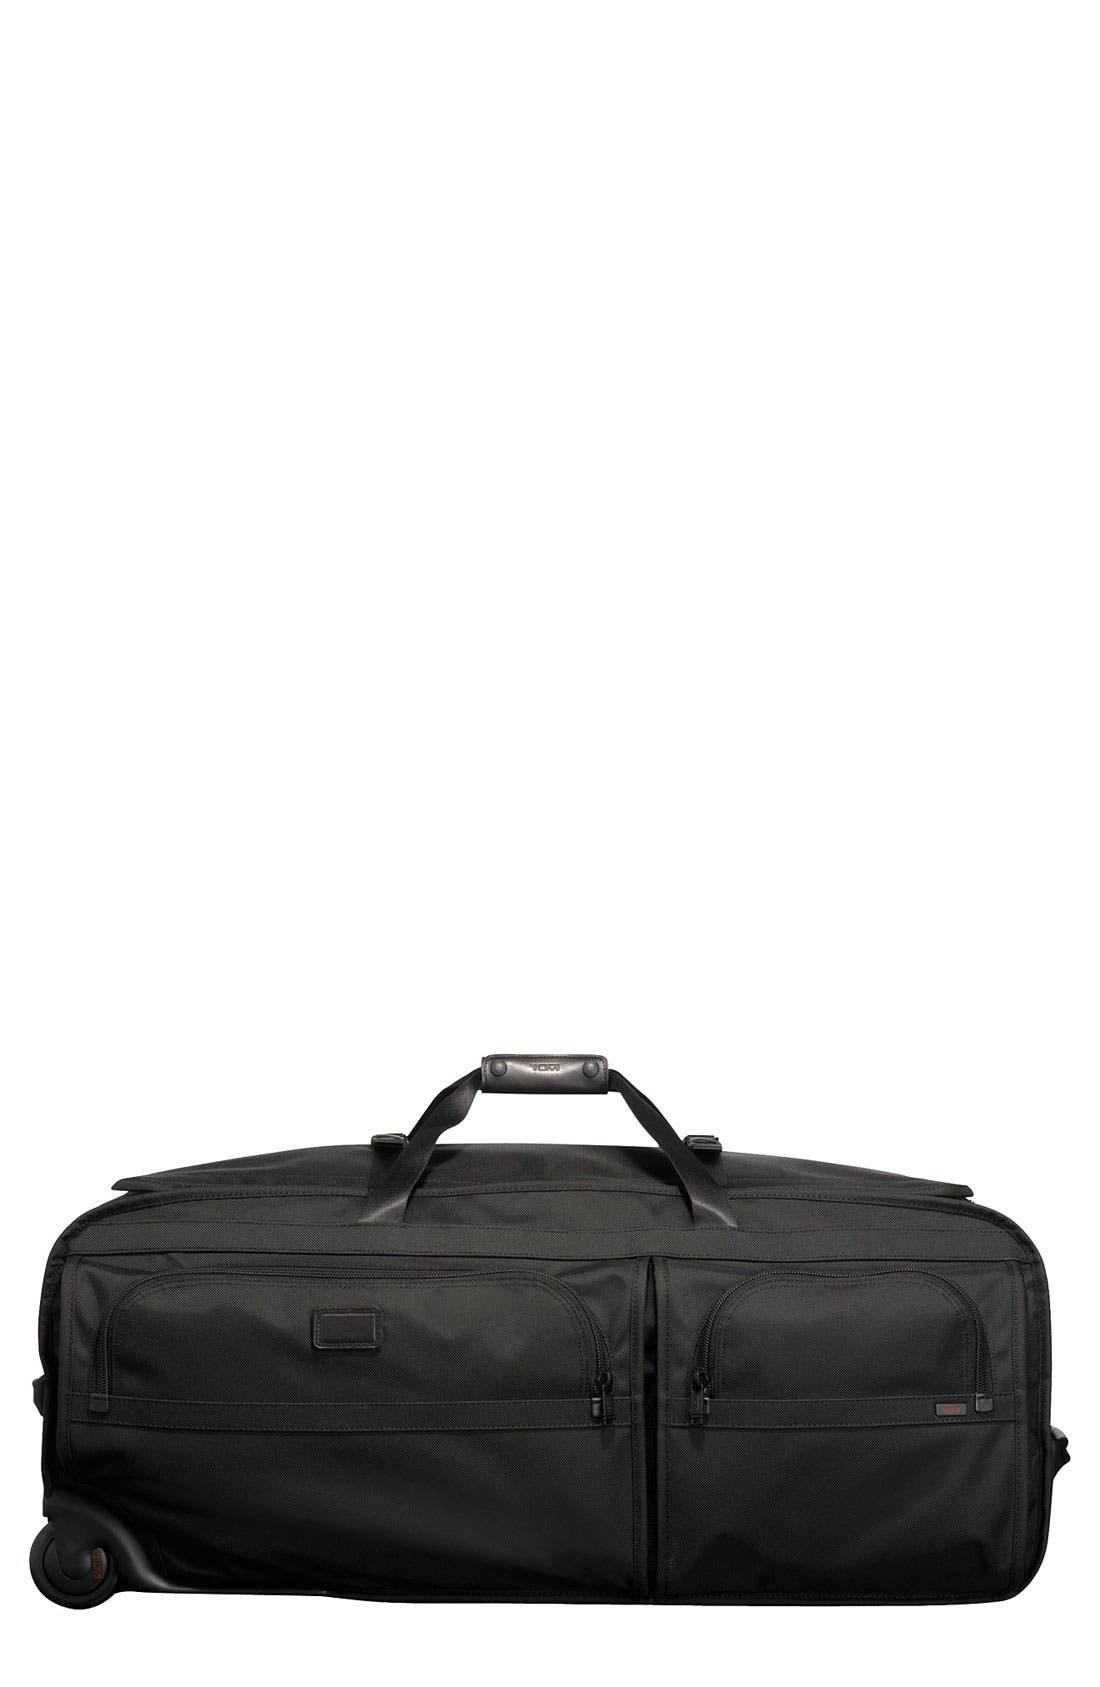 Alternate Image 1 Selected - Tumi 'Alpha - Extra Large' Wheeled Duffel Bag